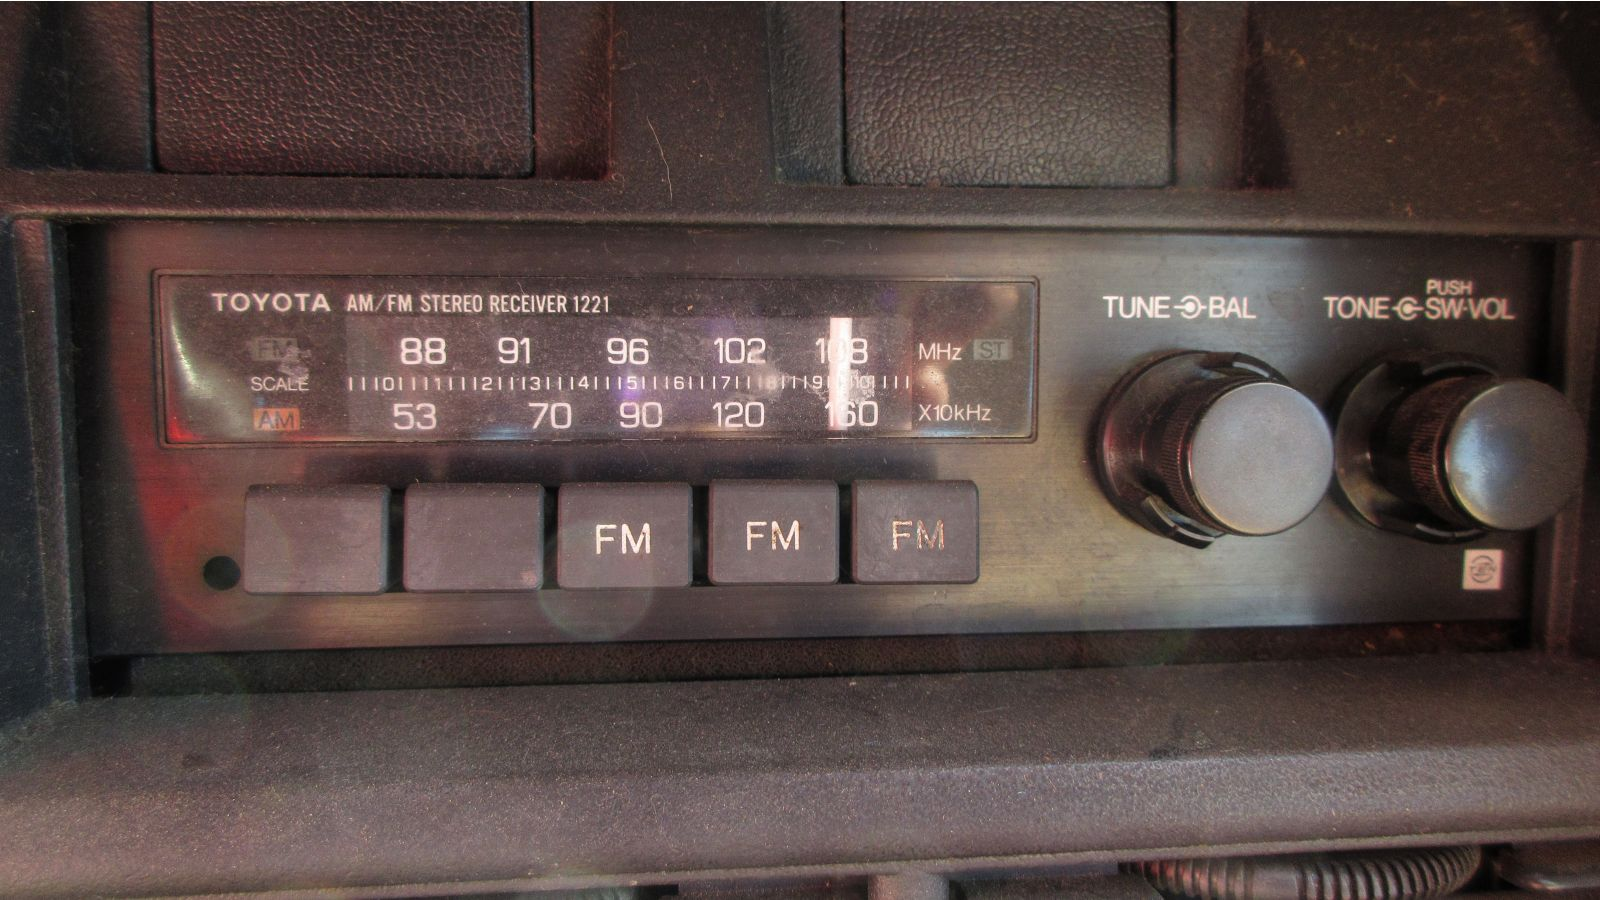 1982 toyota corolla sedan autoblog rh autoblog com 1983 Toyota Corolla 1980 Toyota Corolla